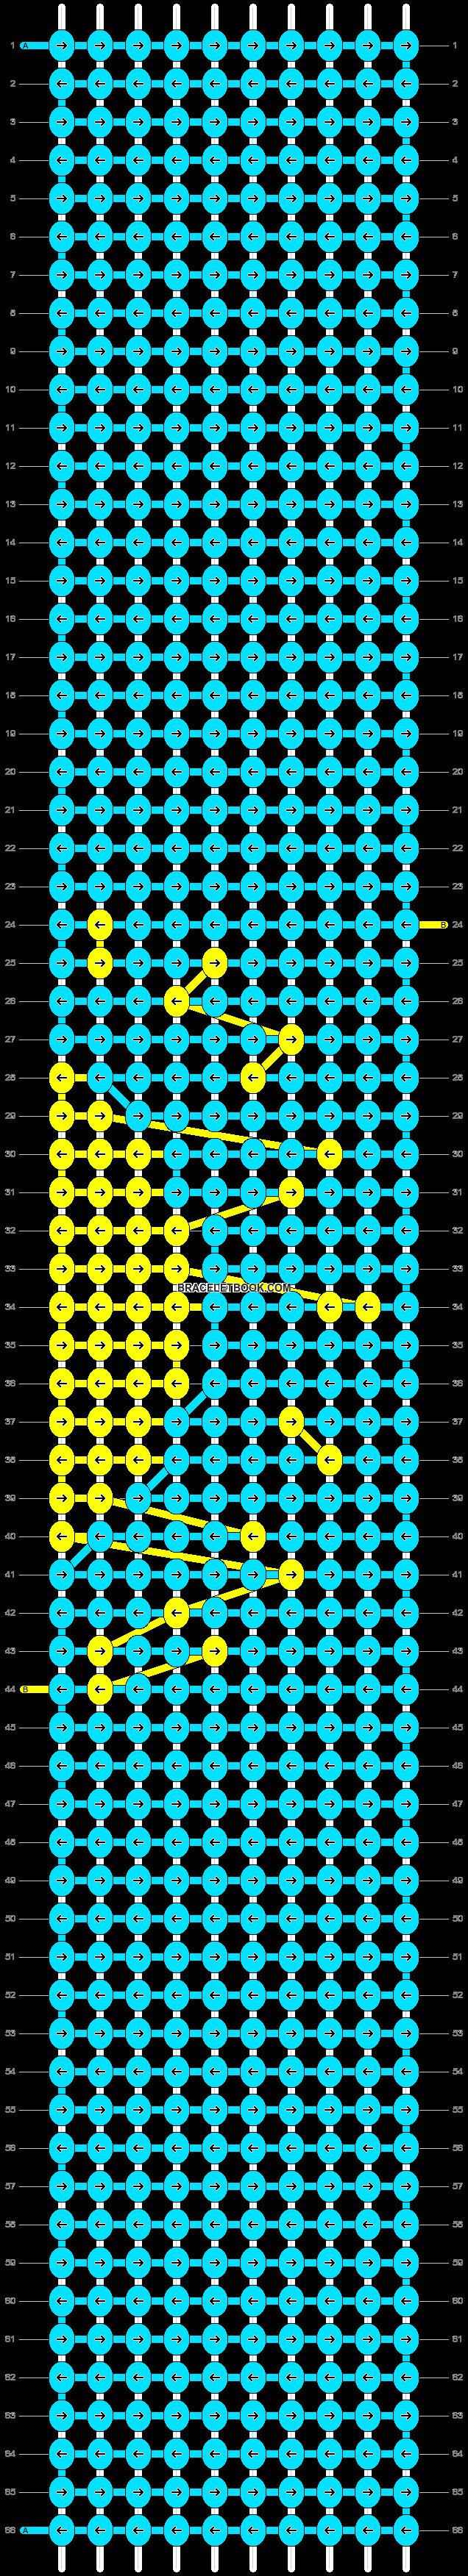 Alpha pattern #40359 pattern